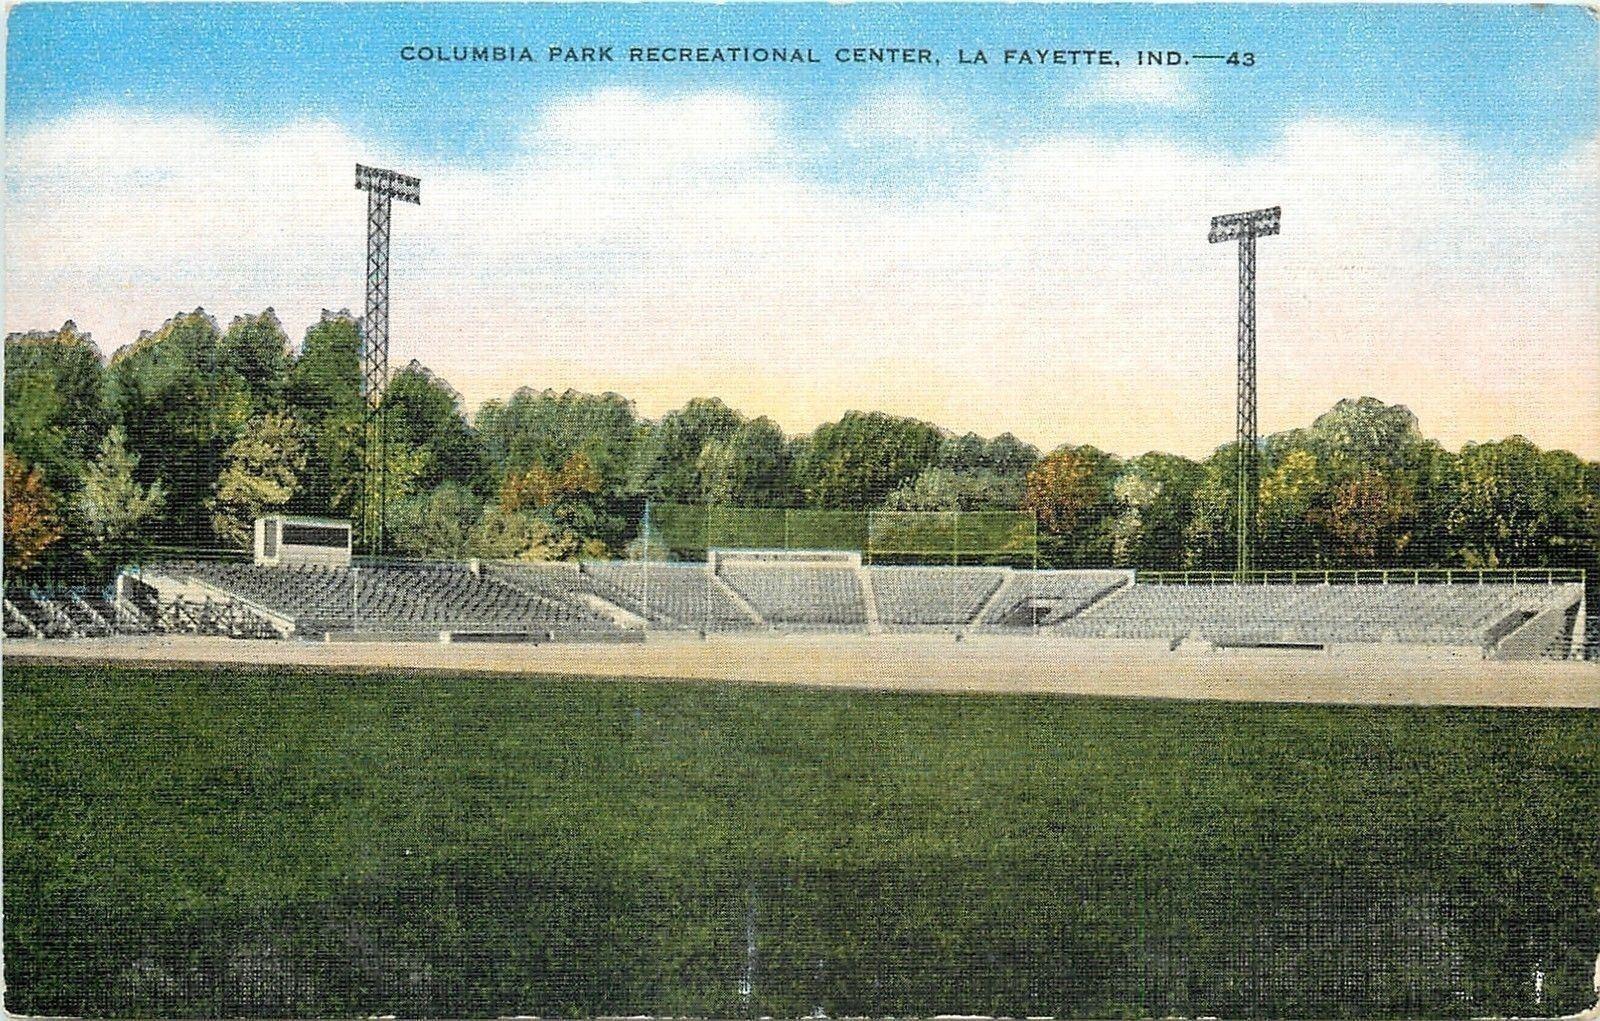 La Fayette Indiana~Columbia Park Recreational Center